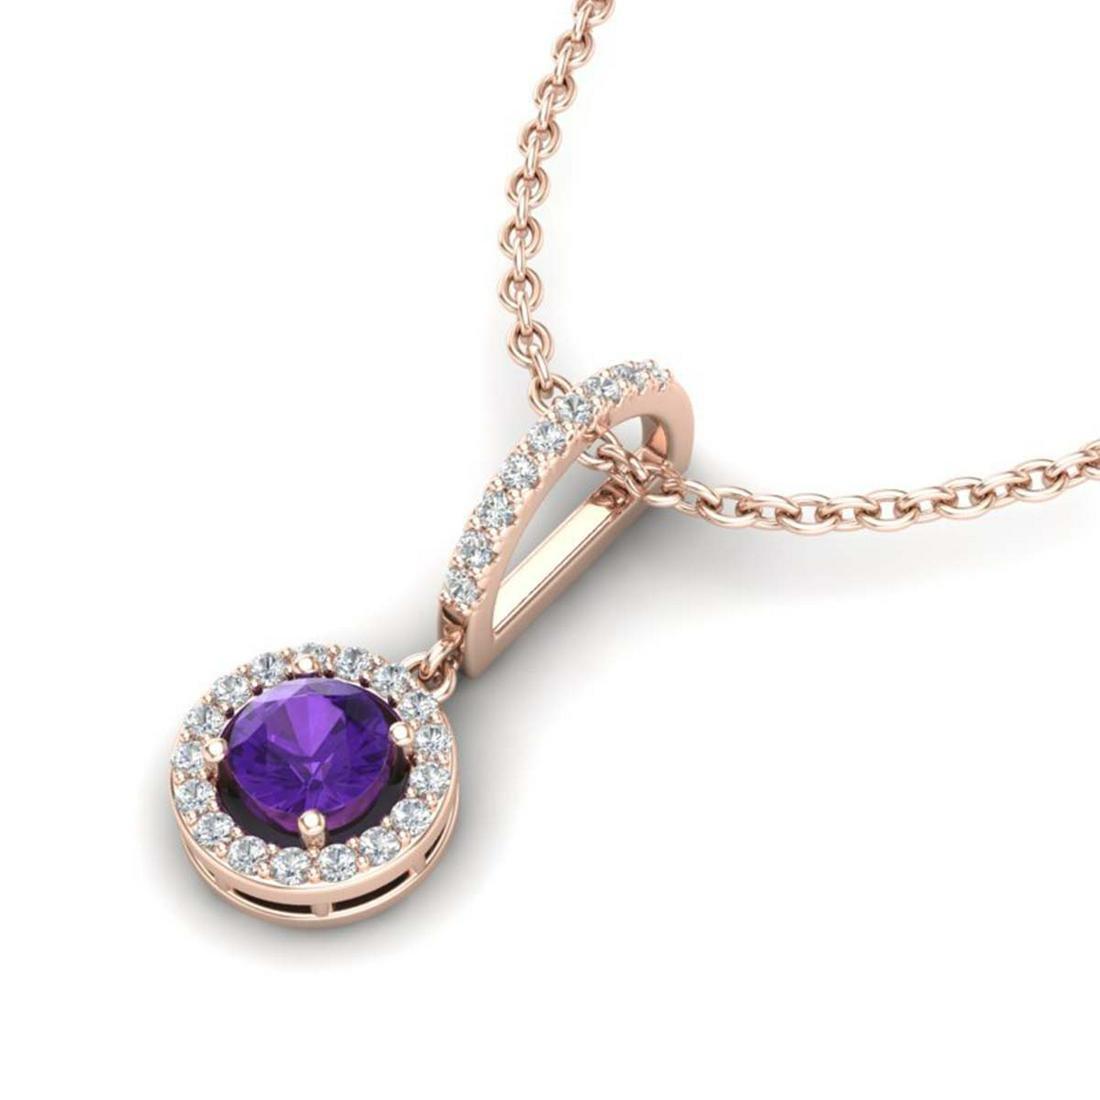 1 ctw Amethyst & Halo VS/SI Diamond Necklace 14K Rose